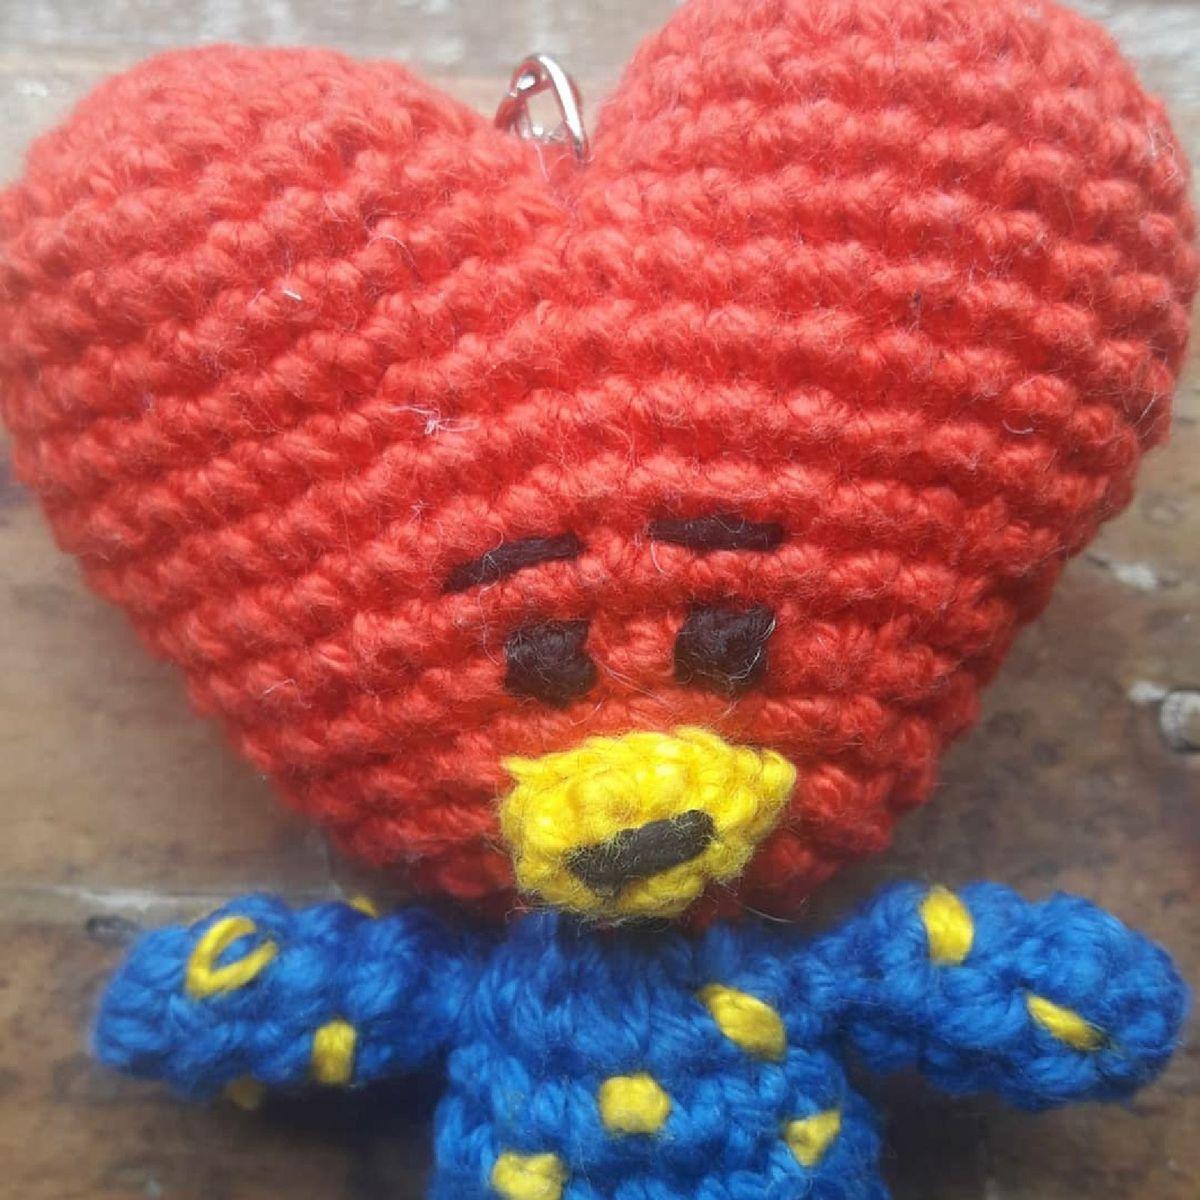 Crochet Amigurumi TATA BT21 Plush | 1200x1200